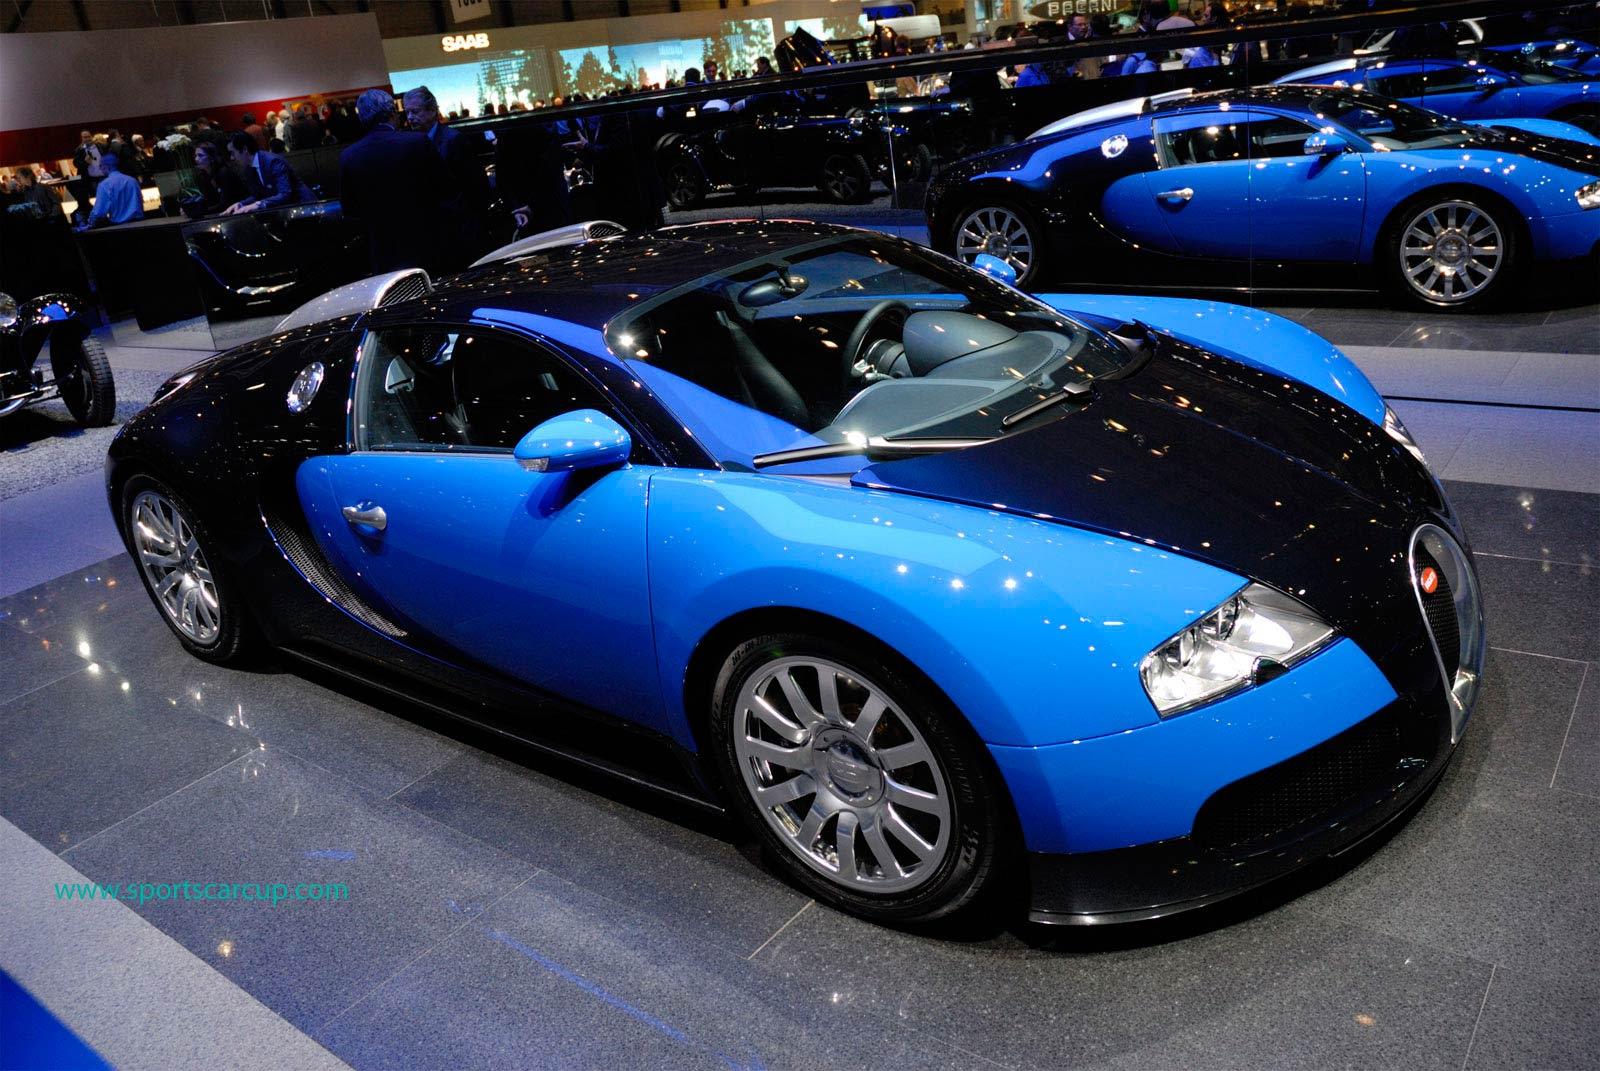 Black Bugatti Veyron 5 High Resolution Wallpaper  Hdblackwallpaper.com